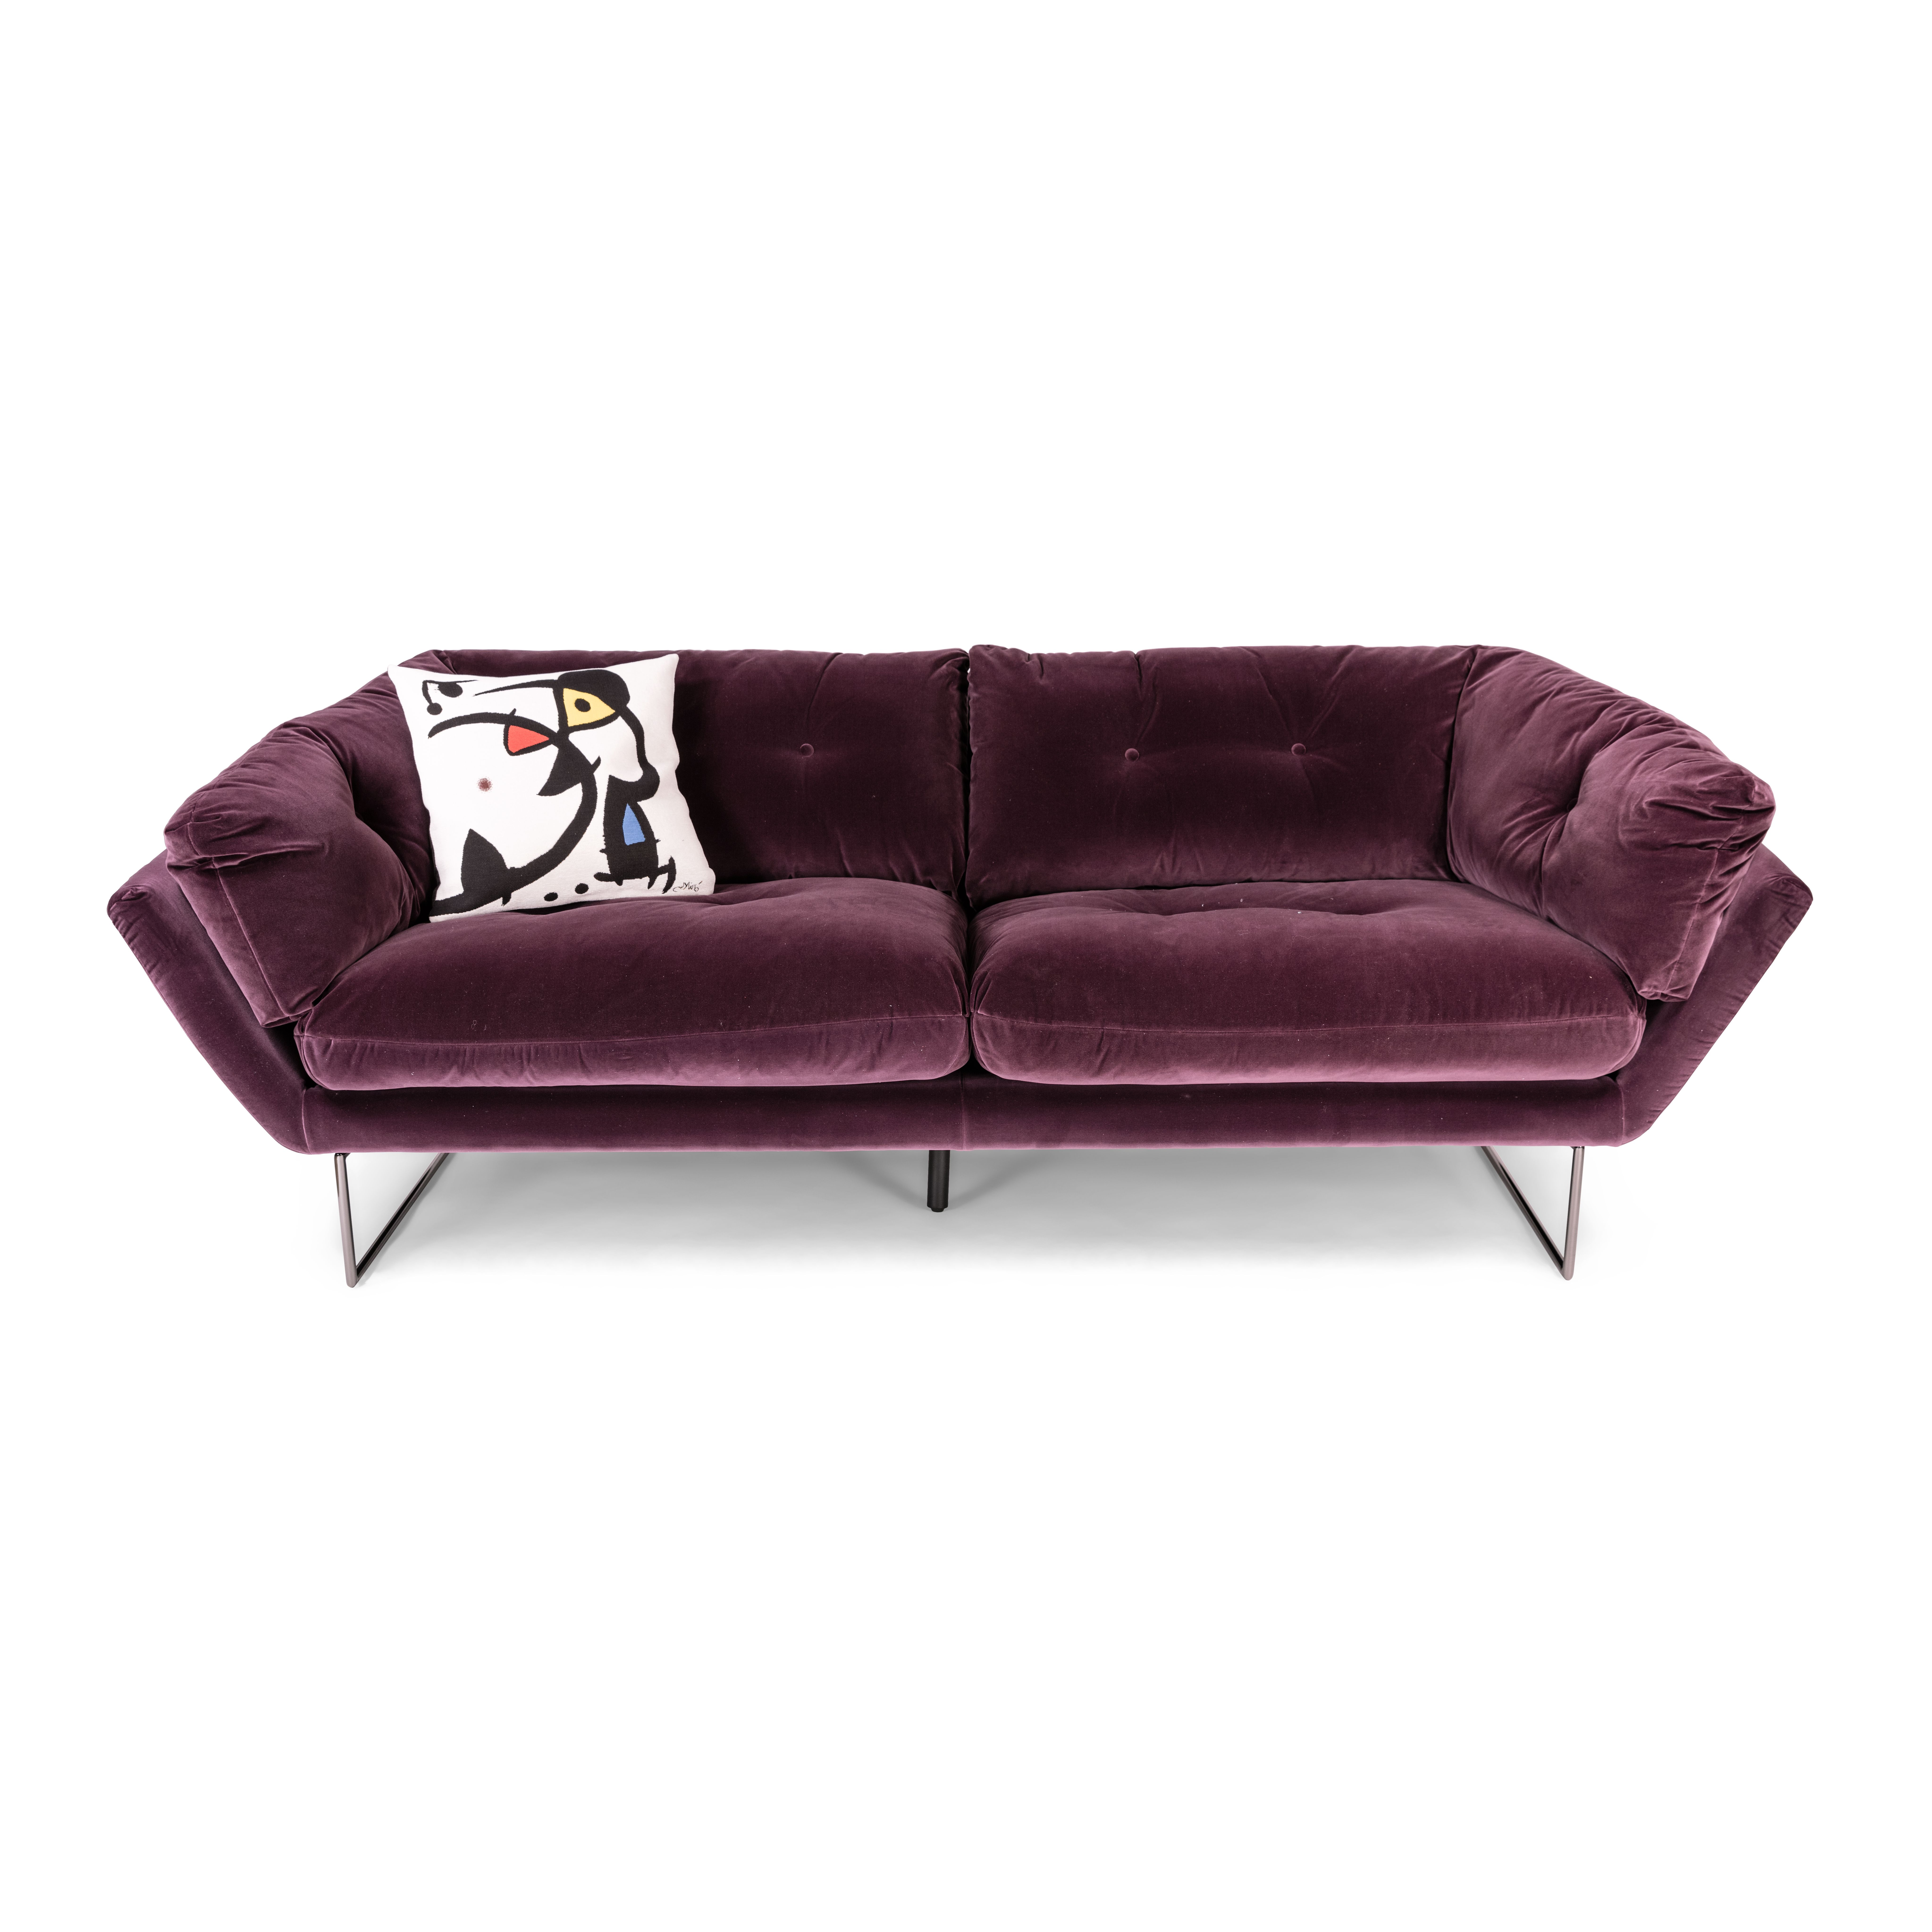 Ganado Loveseat Low Back Sofa Sofa Mid Century Modern Design